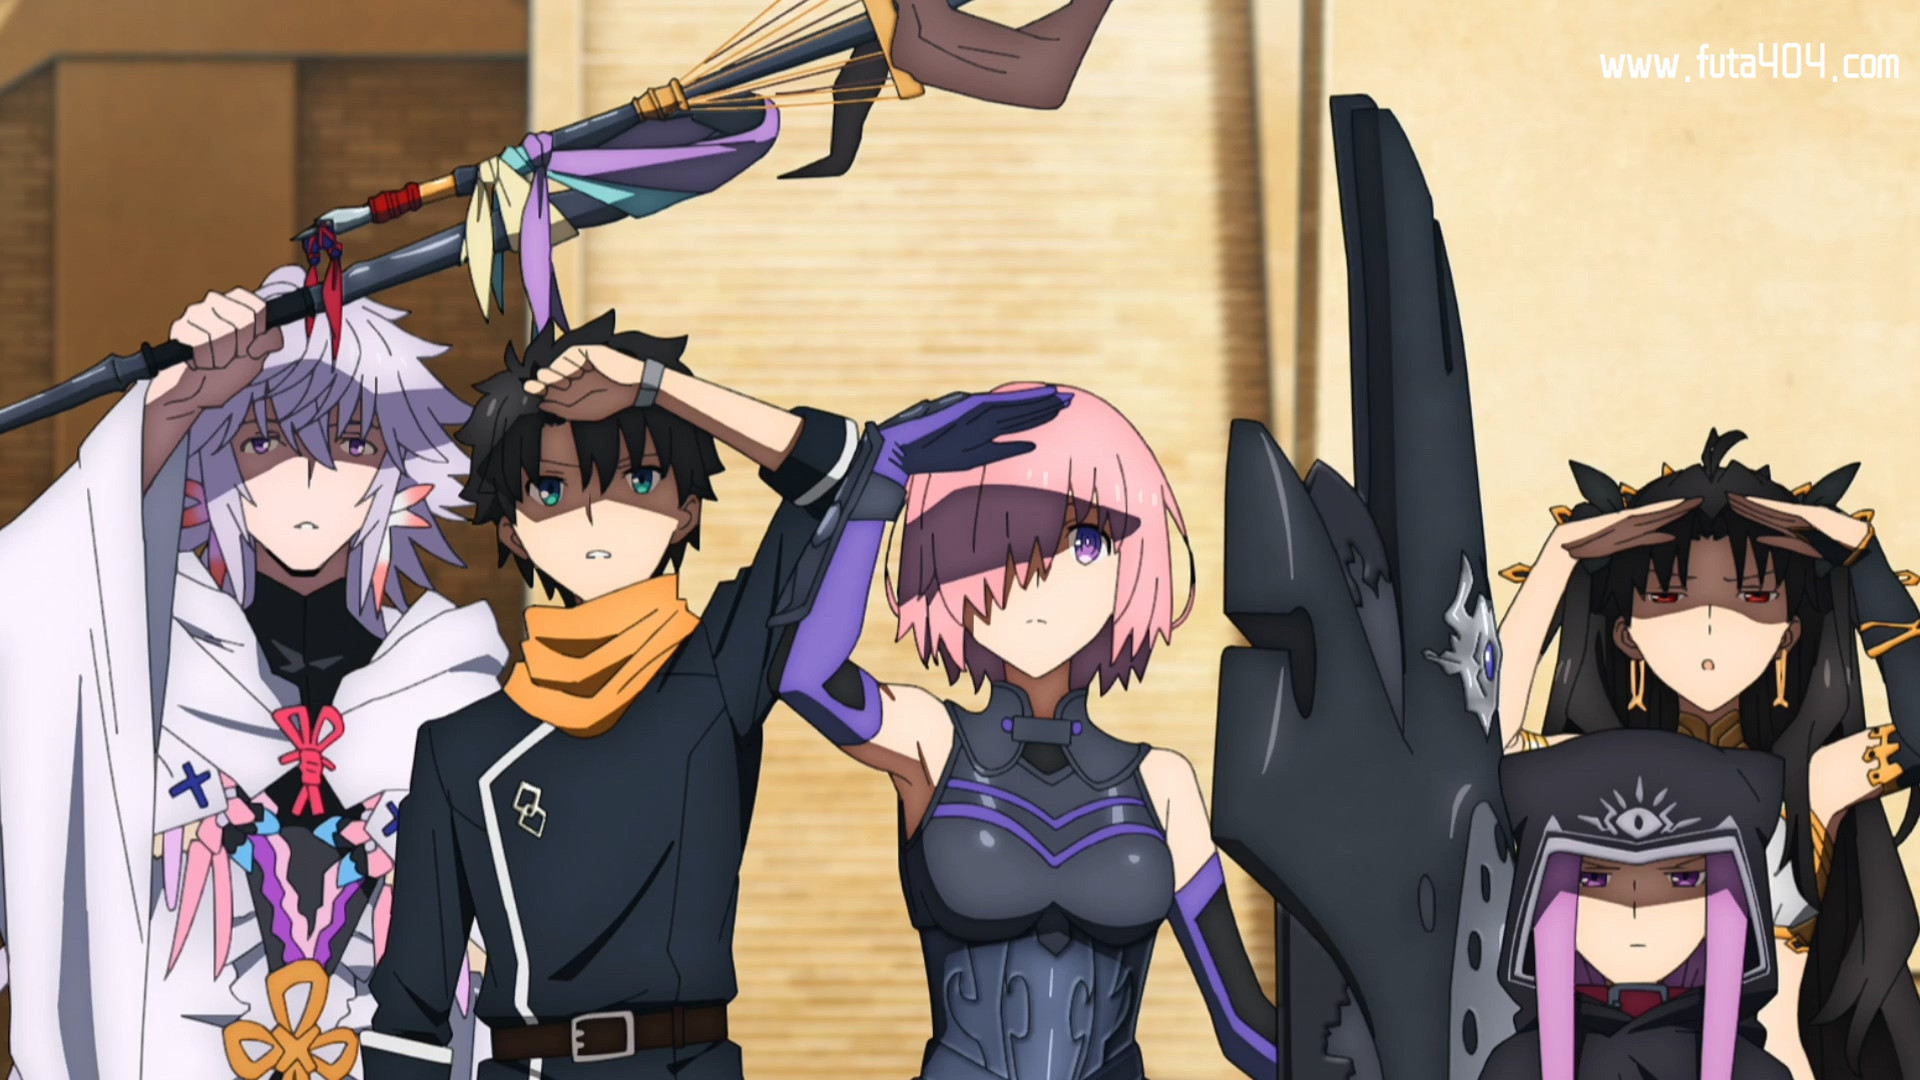 Fate Grand Order 绝对魔兽战线巴比伦尼亚 第10话 Fate Grand Order 动画在线 第1张